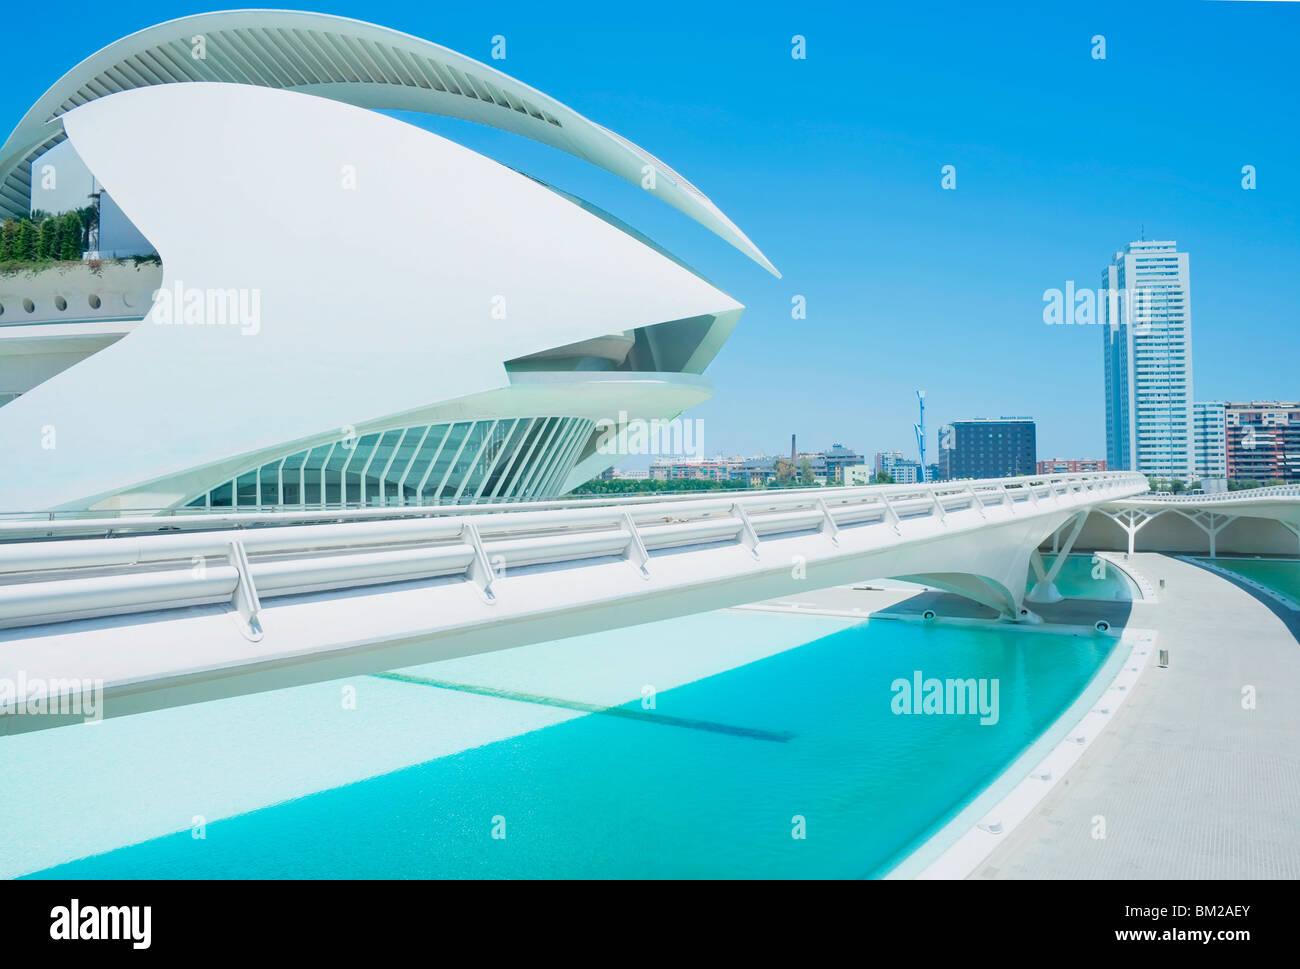 Palau de les Arts and bridge, City of Arts and Sciences, Valencia, Comunidad Autonoma de Valencia, Spain - Stock Image